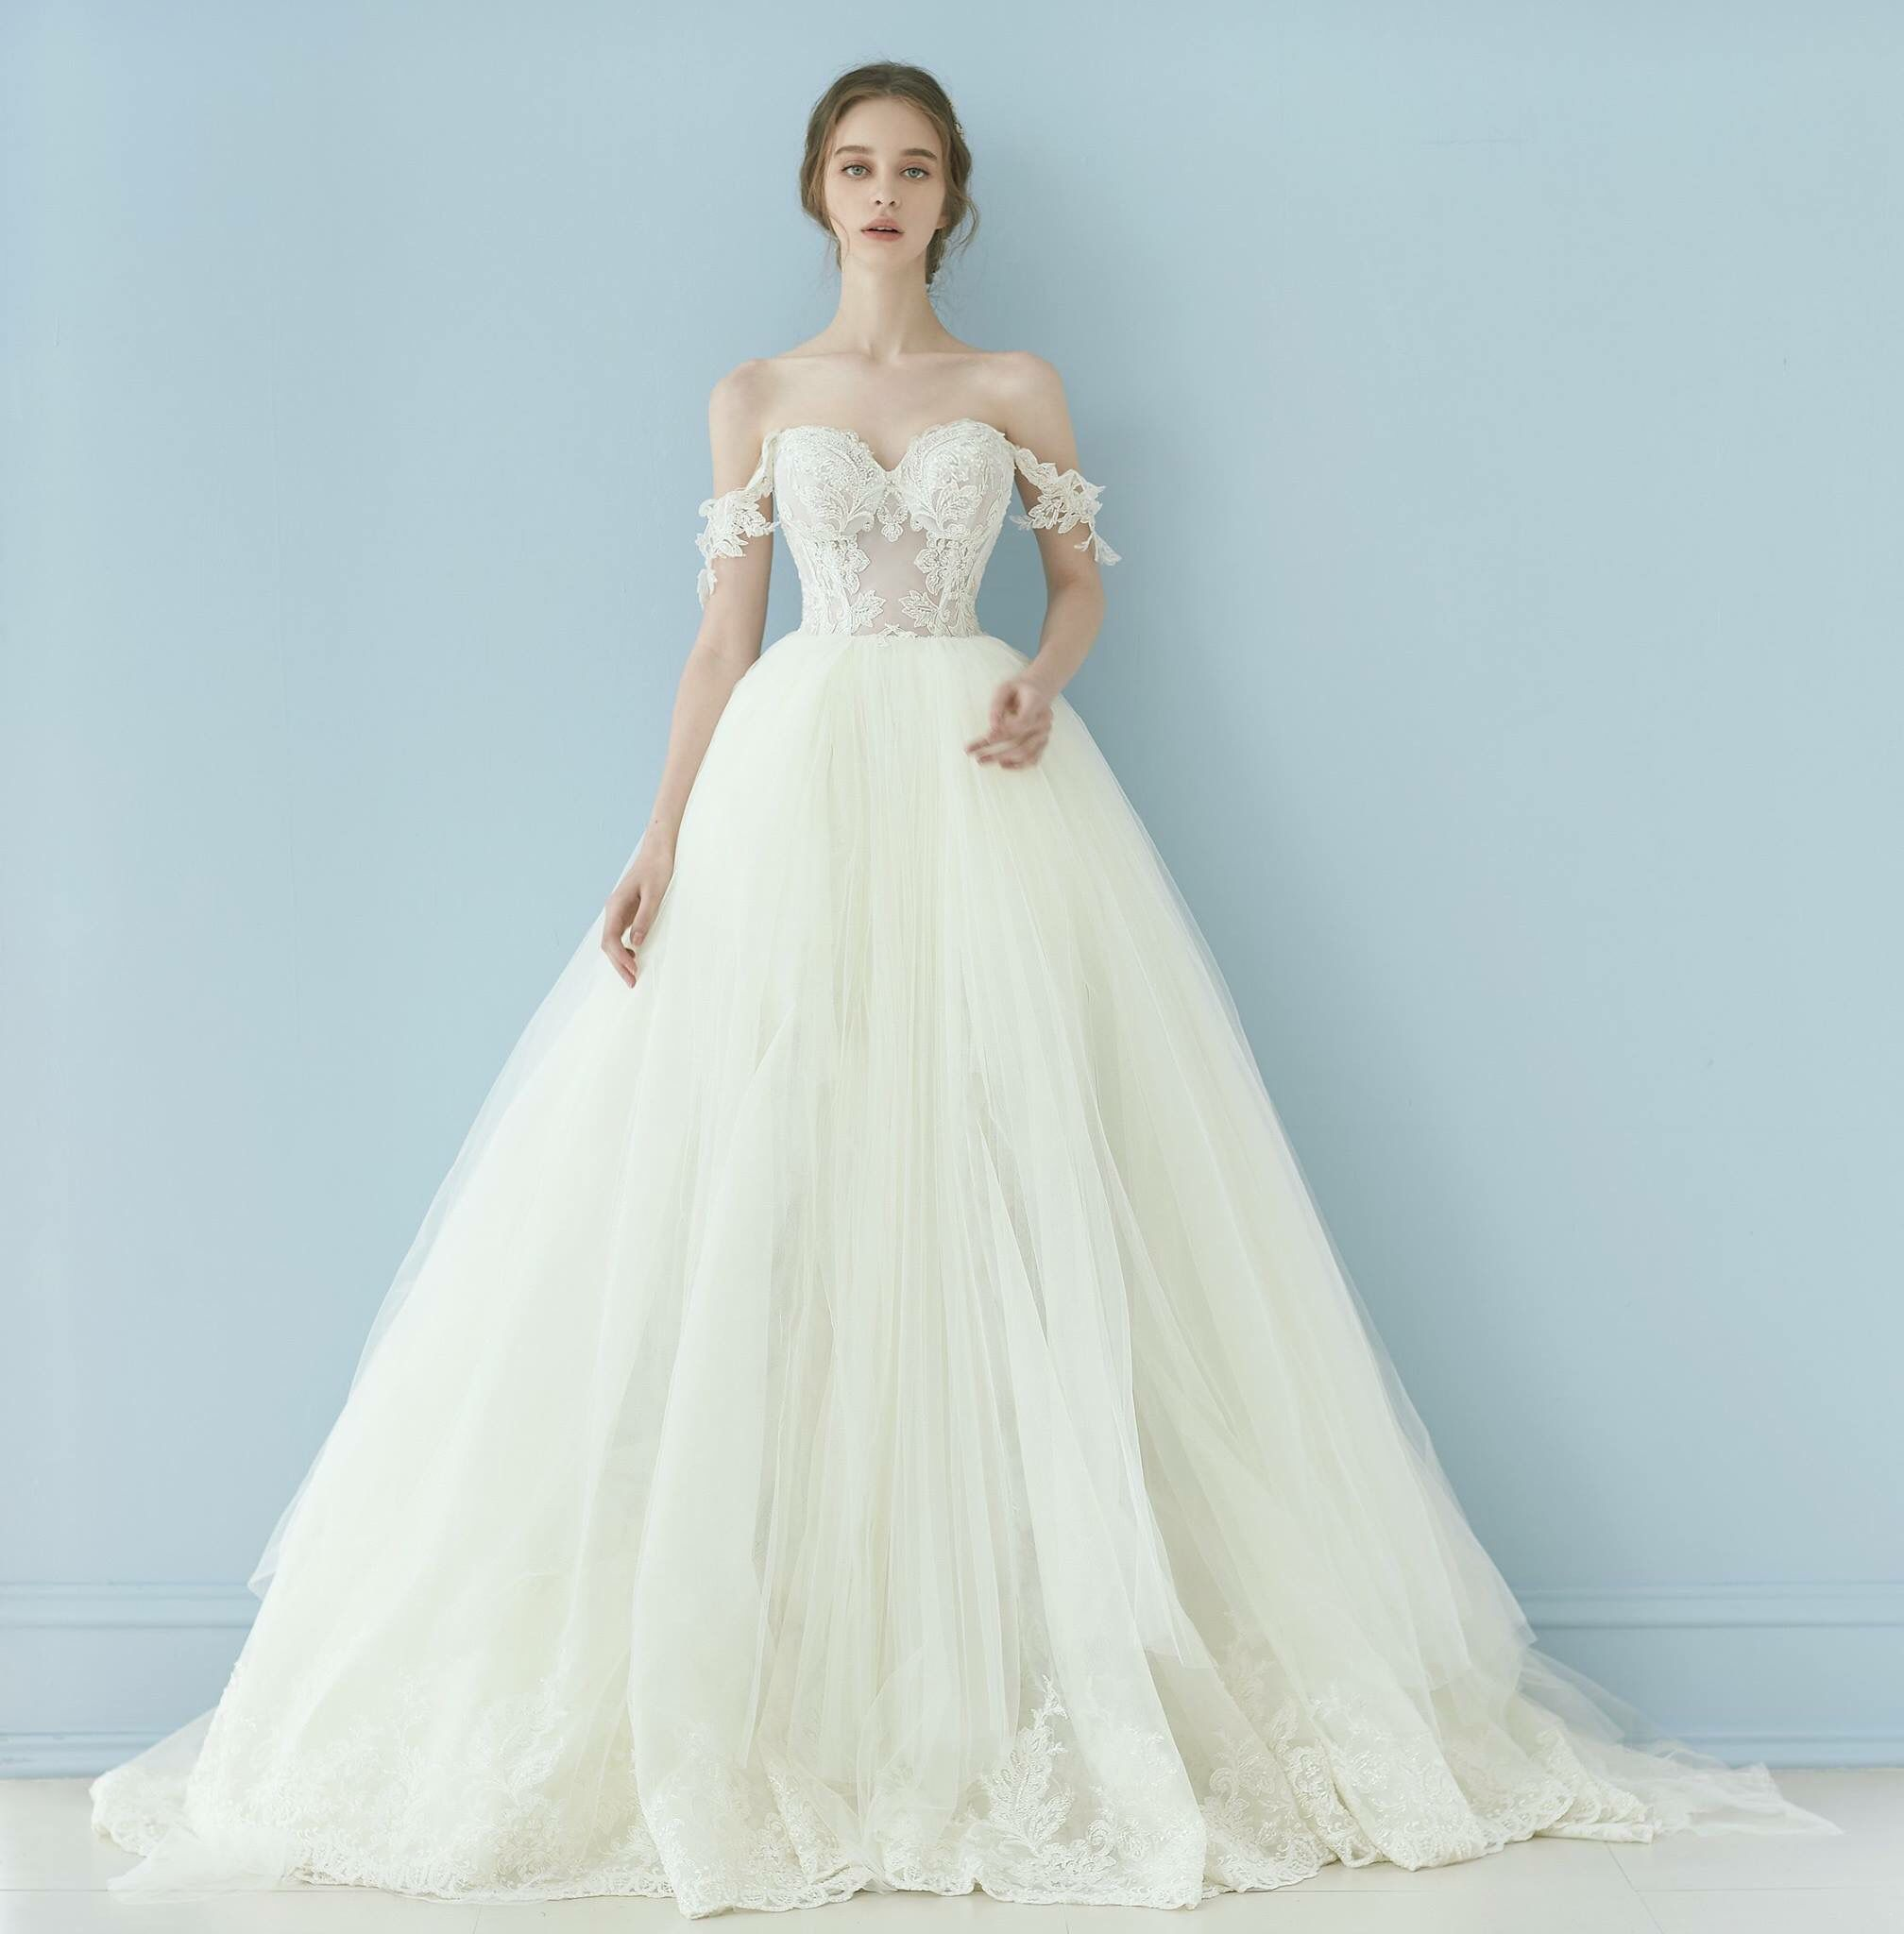 Abito sposa | Wedding Bells: Glamorous White | Pinterest | Wedding ...